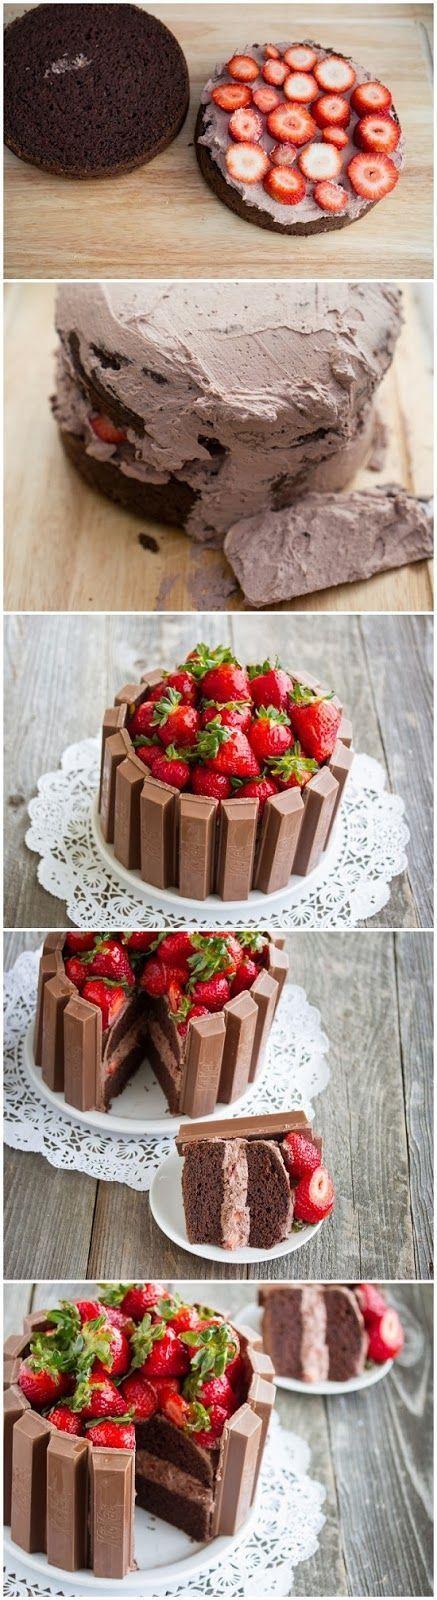 Strawberry Kit Kat Cake recipe recipes desert recipes valentines day recipes food tutorials valentines ideas